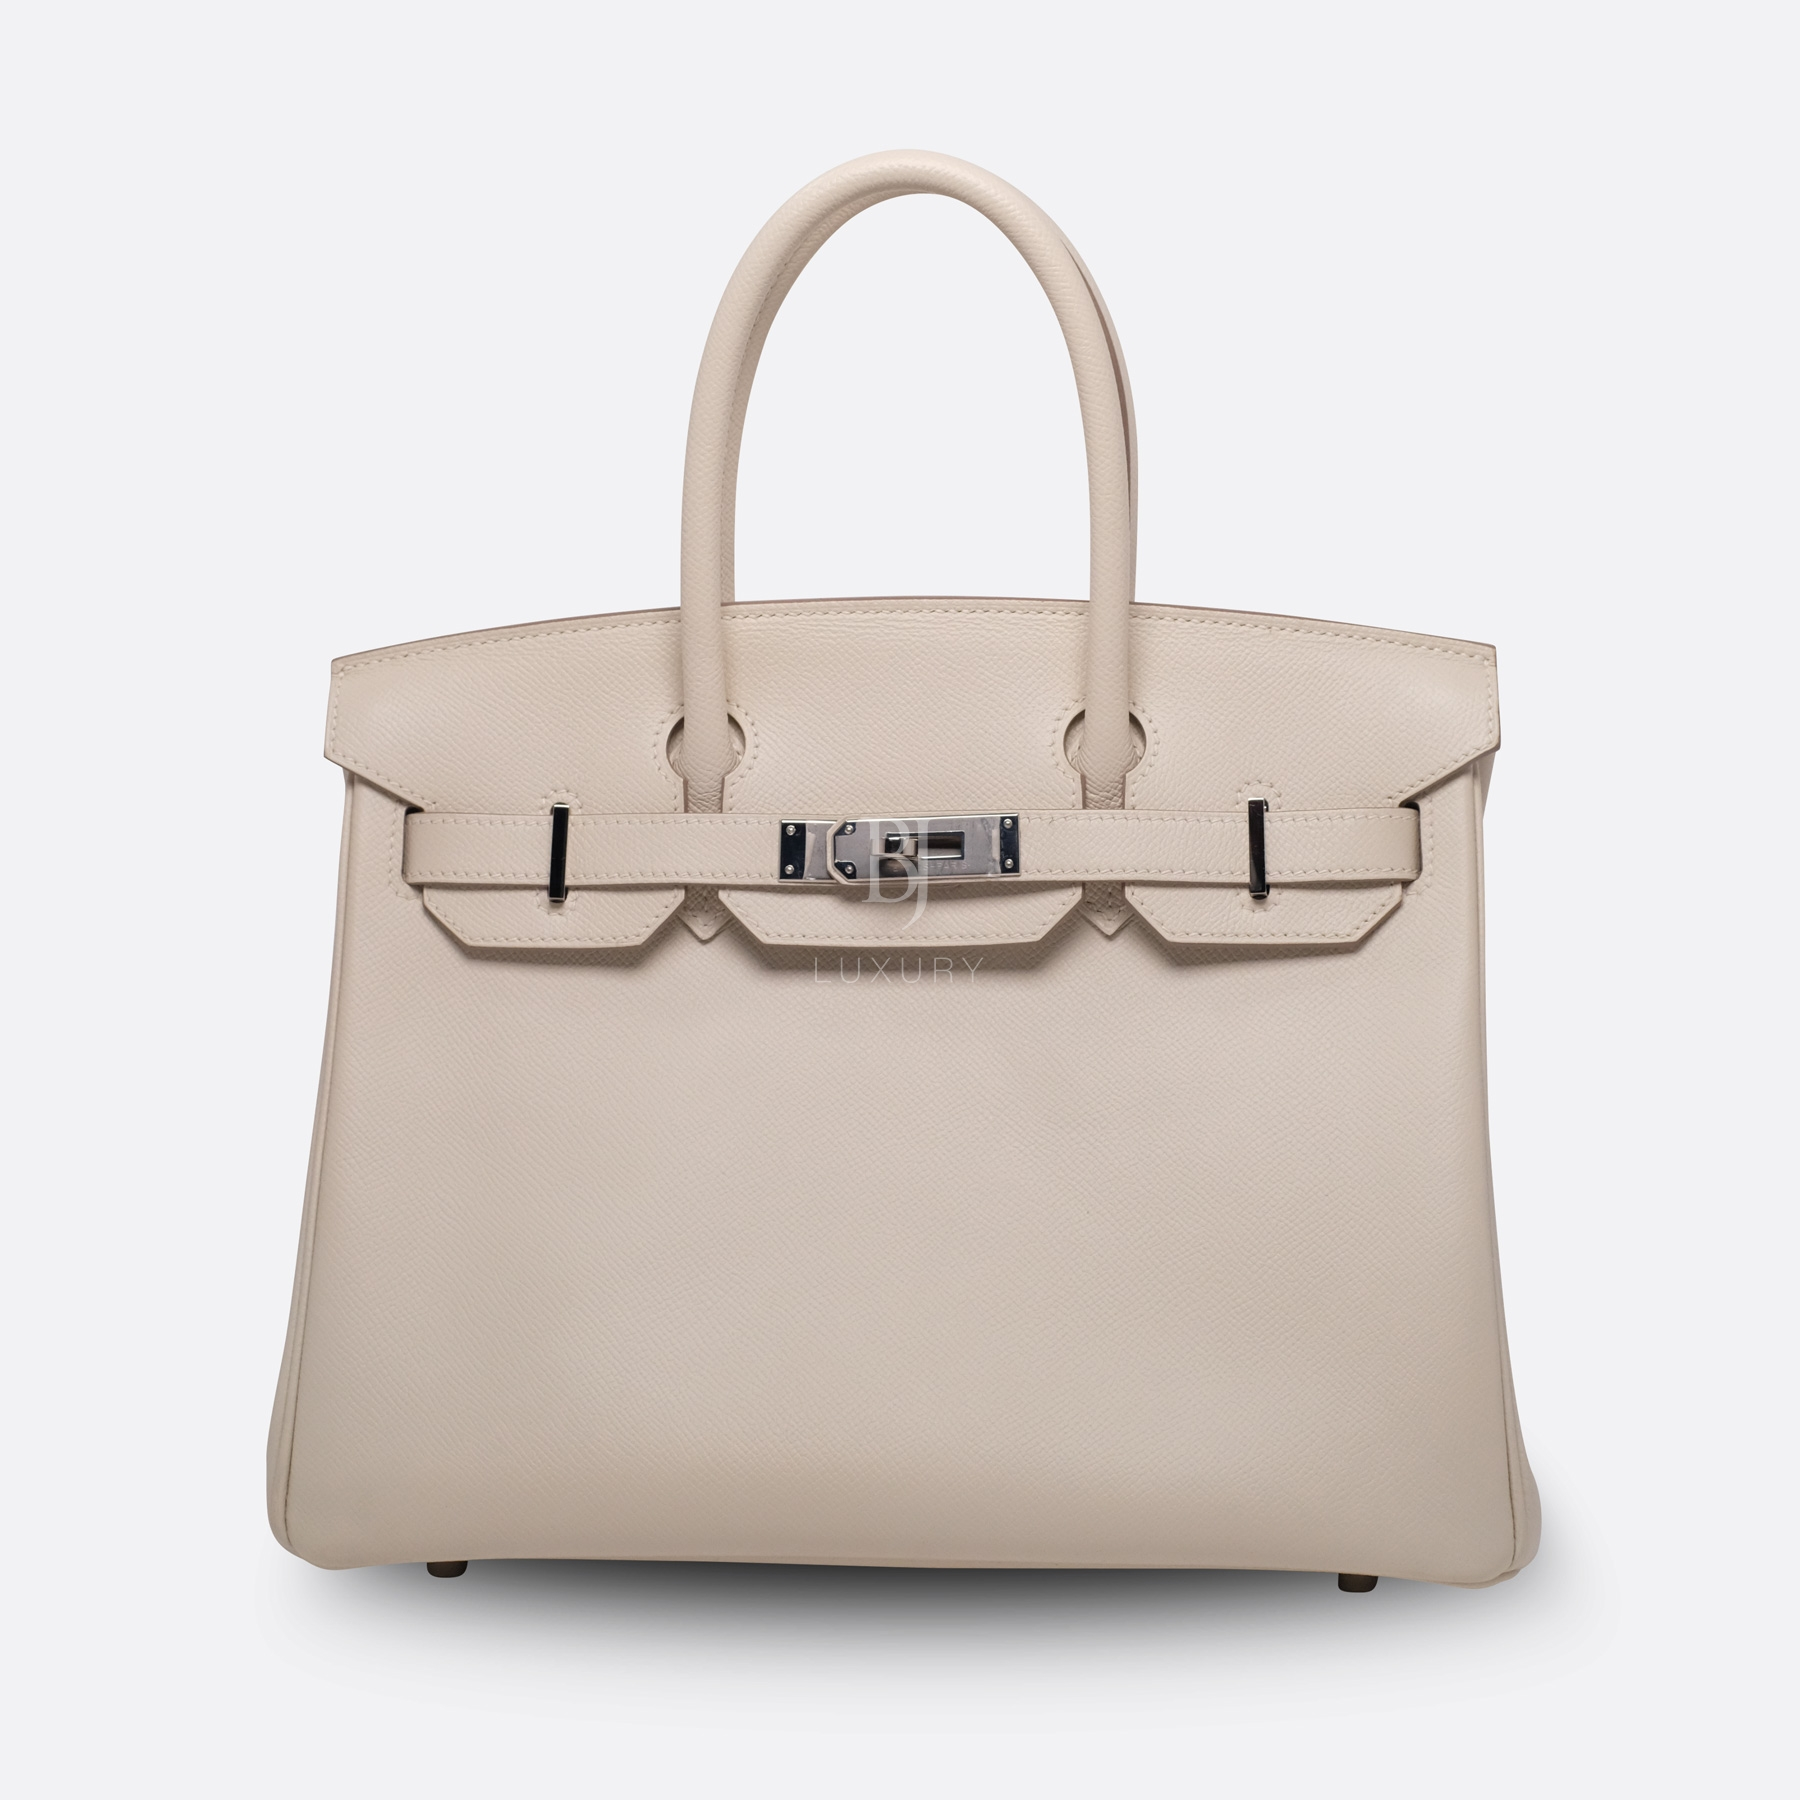 Hermes Birkin 30 Epsom Craie Palladium BJ Luxury 7.jpg